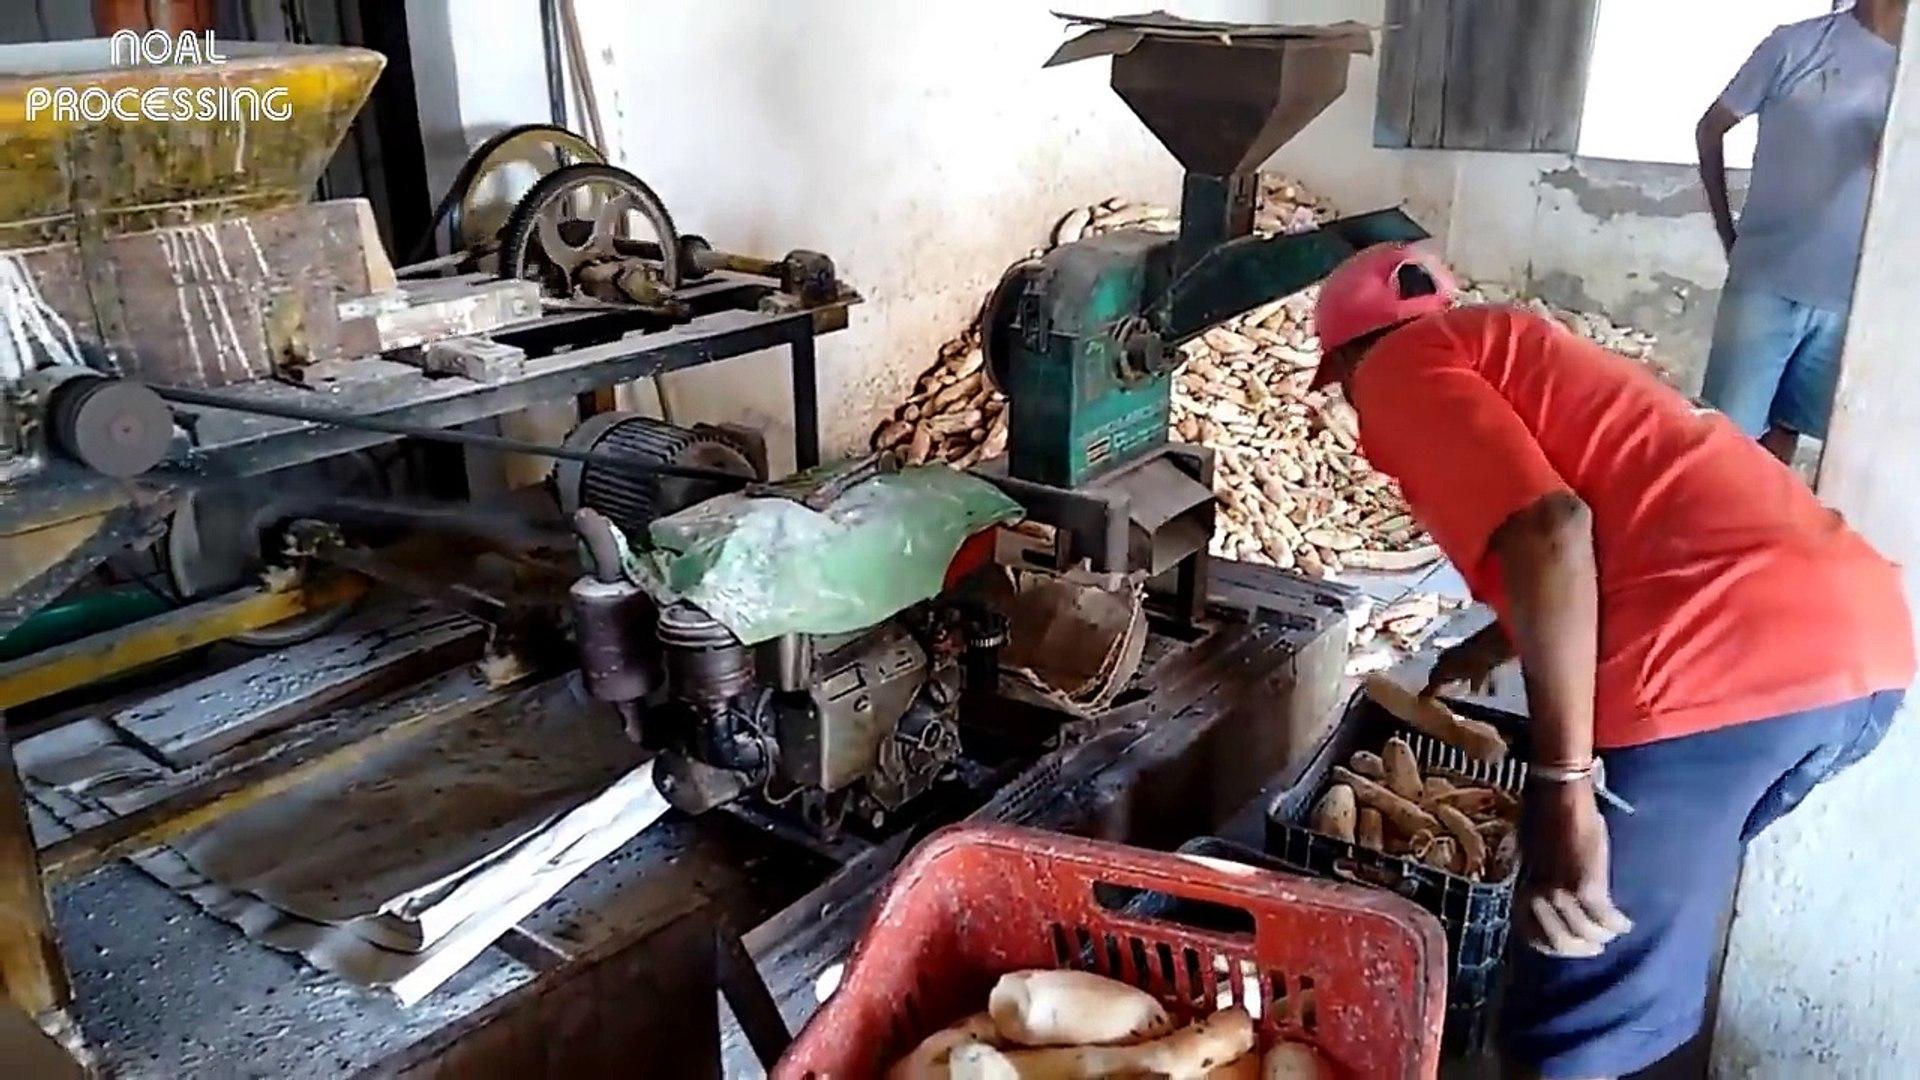 Process Of Making Cassava Flour by Manual Method - Cassava processing line